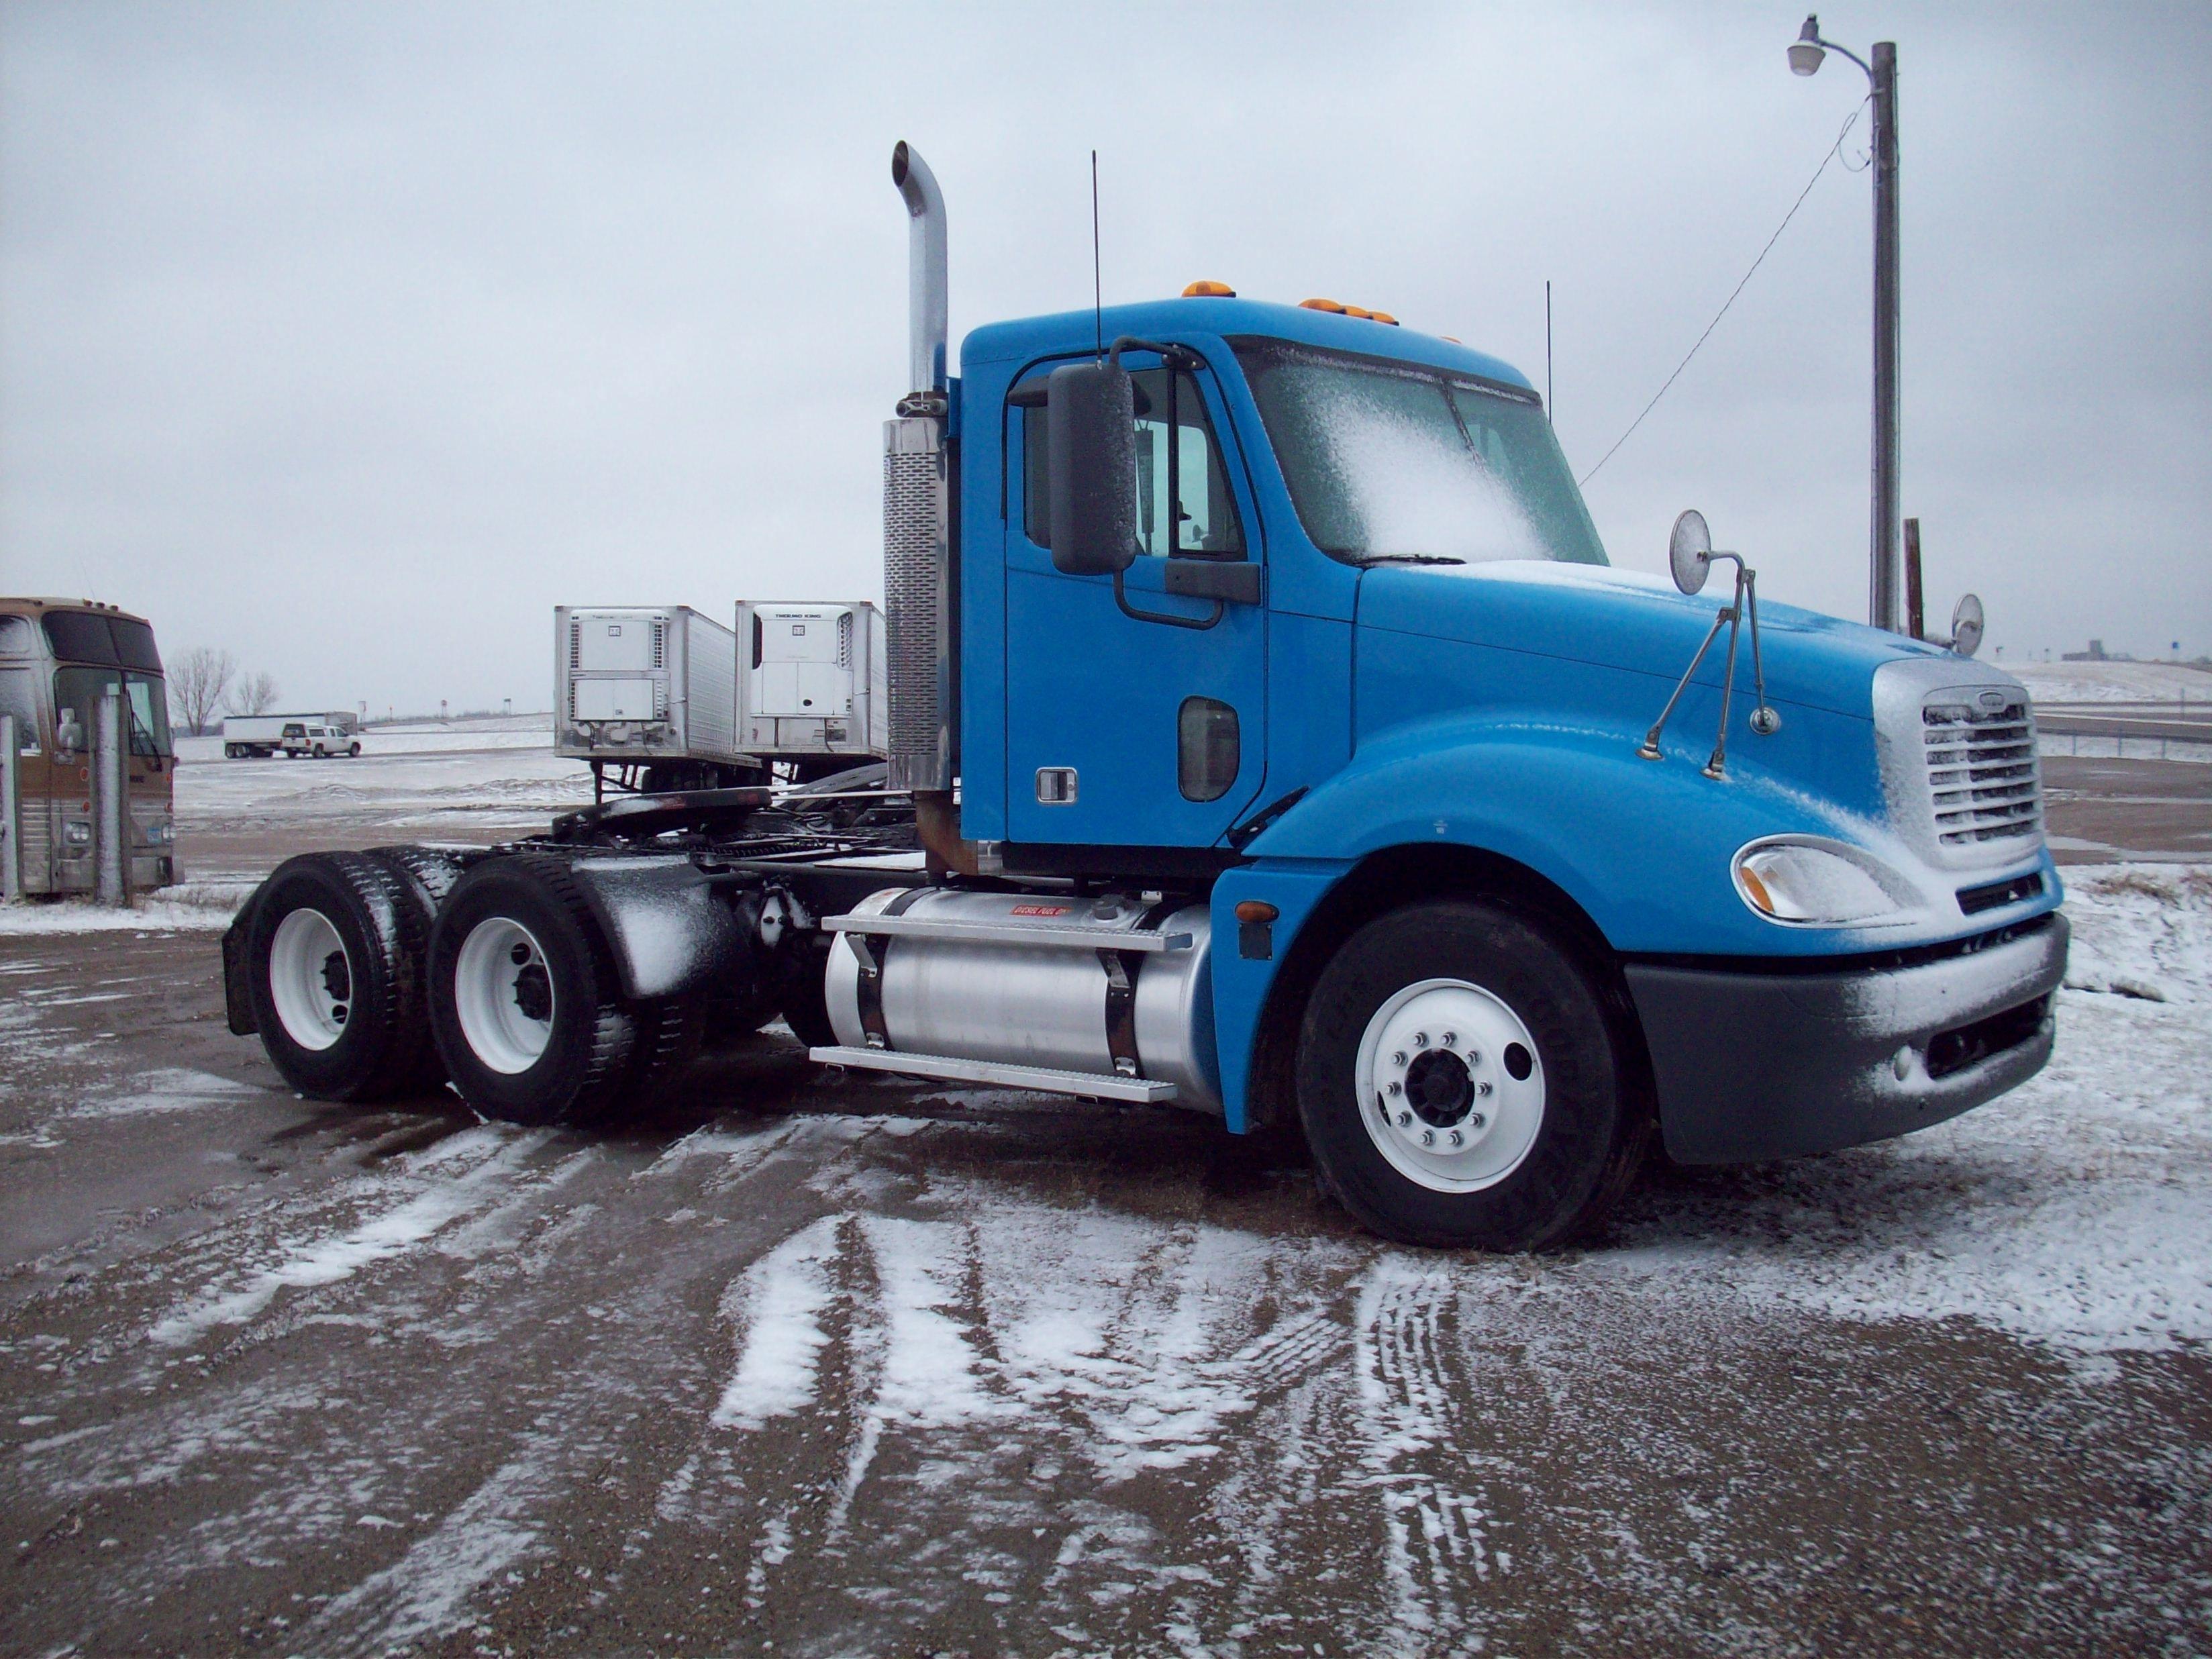 Freightliner cl120 columbia series columbianewssemi truckshtmlphotos